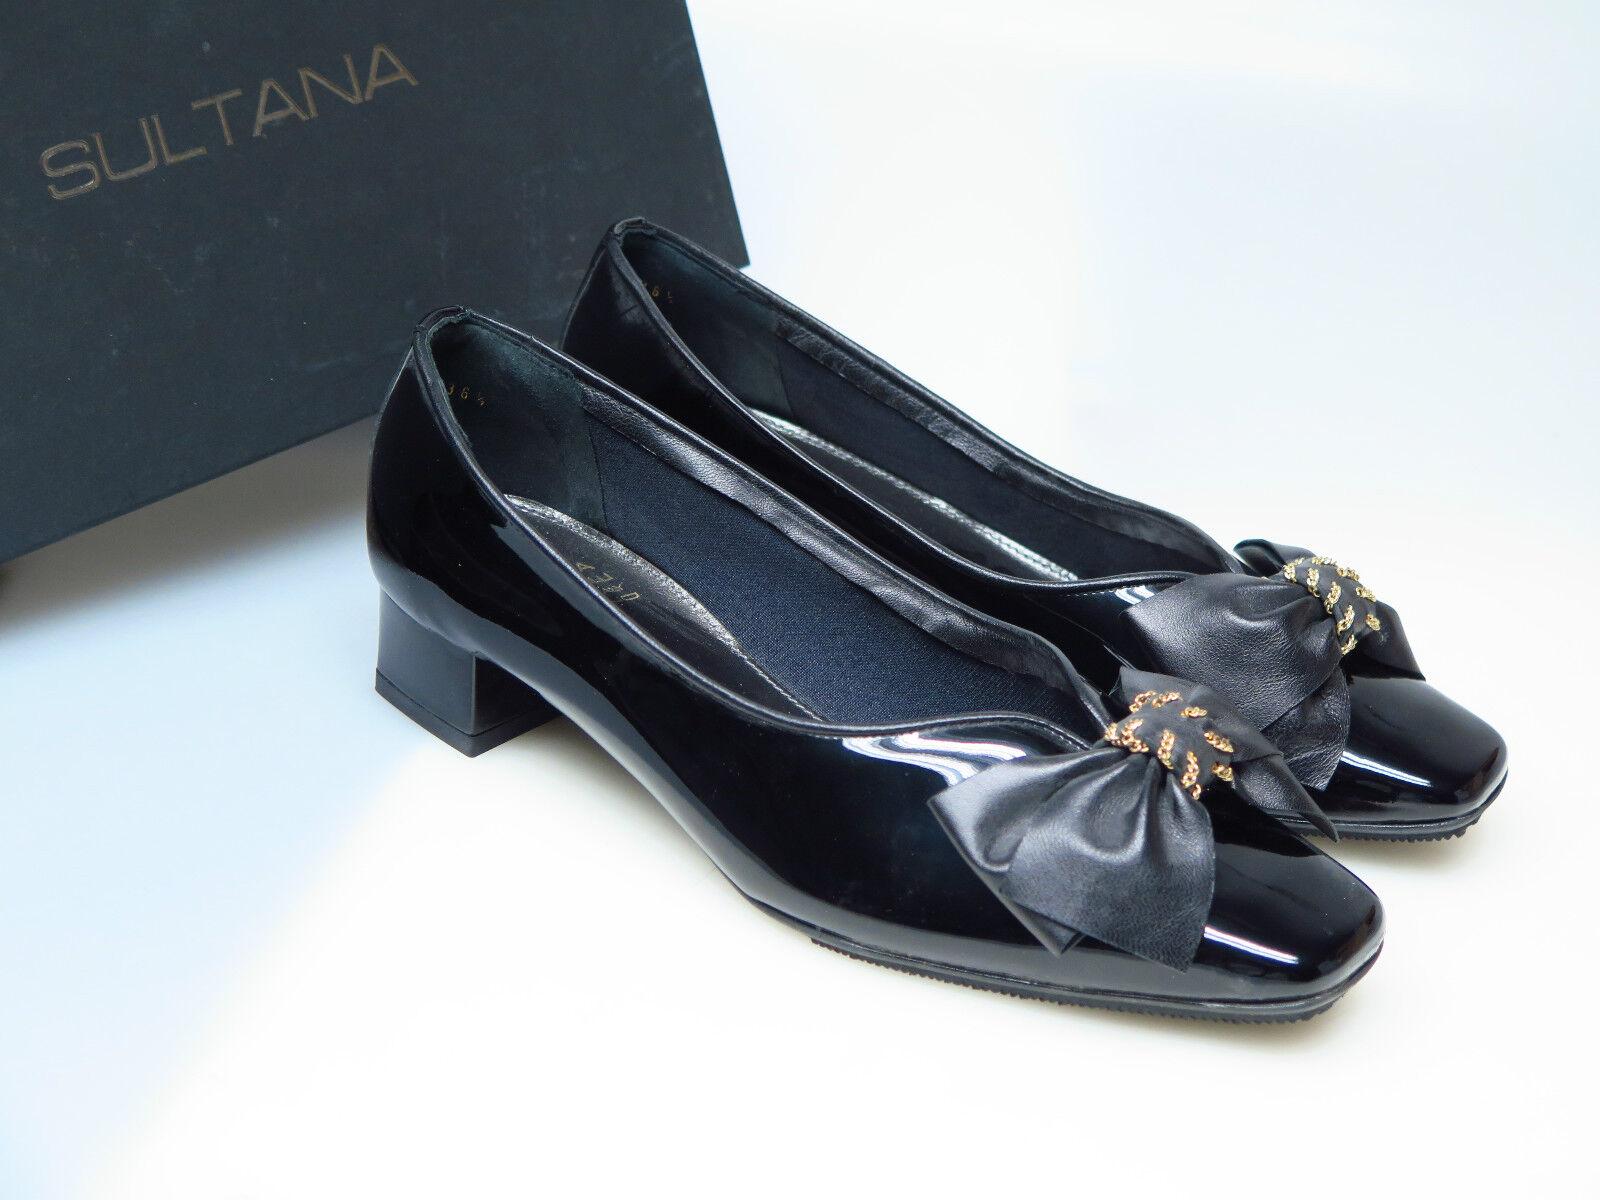 SULTANA Schuhe Designer Damenschuhe N4410-M Lucy Vernice schwarz Gr. 36,5 NEU